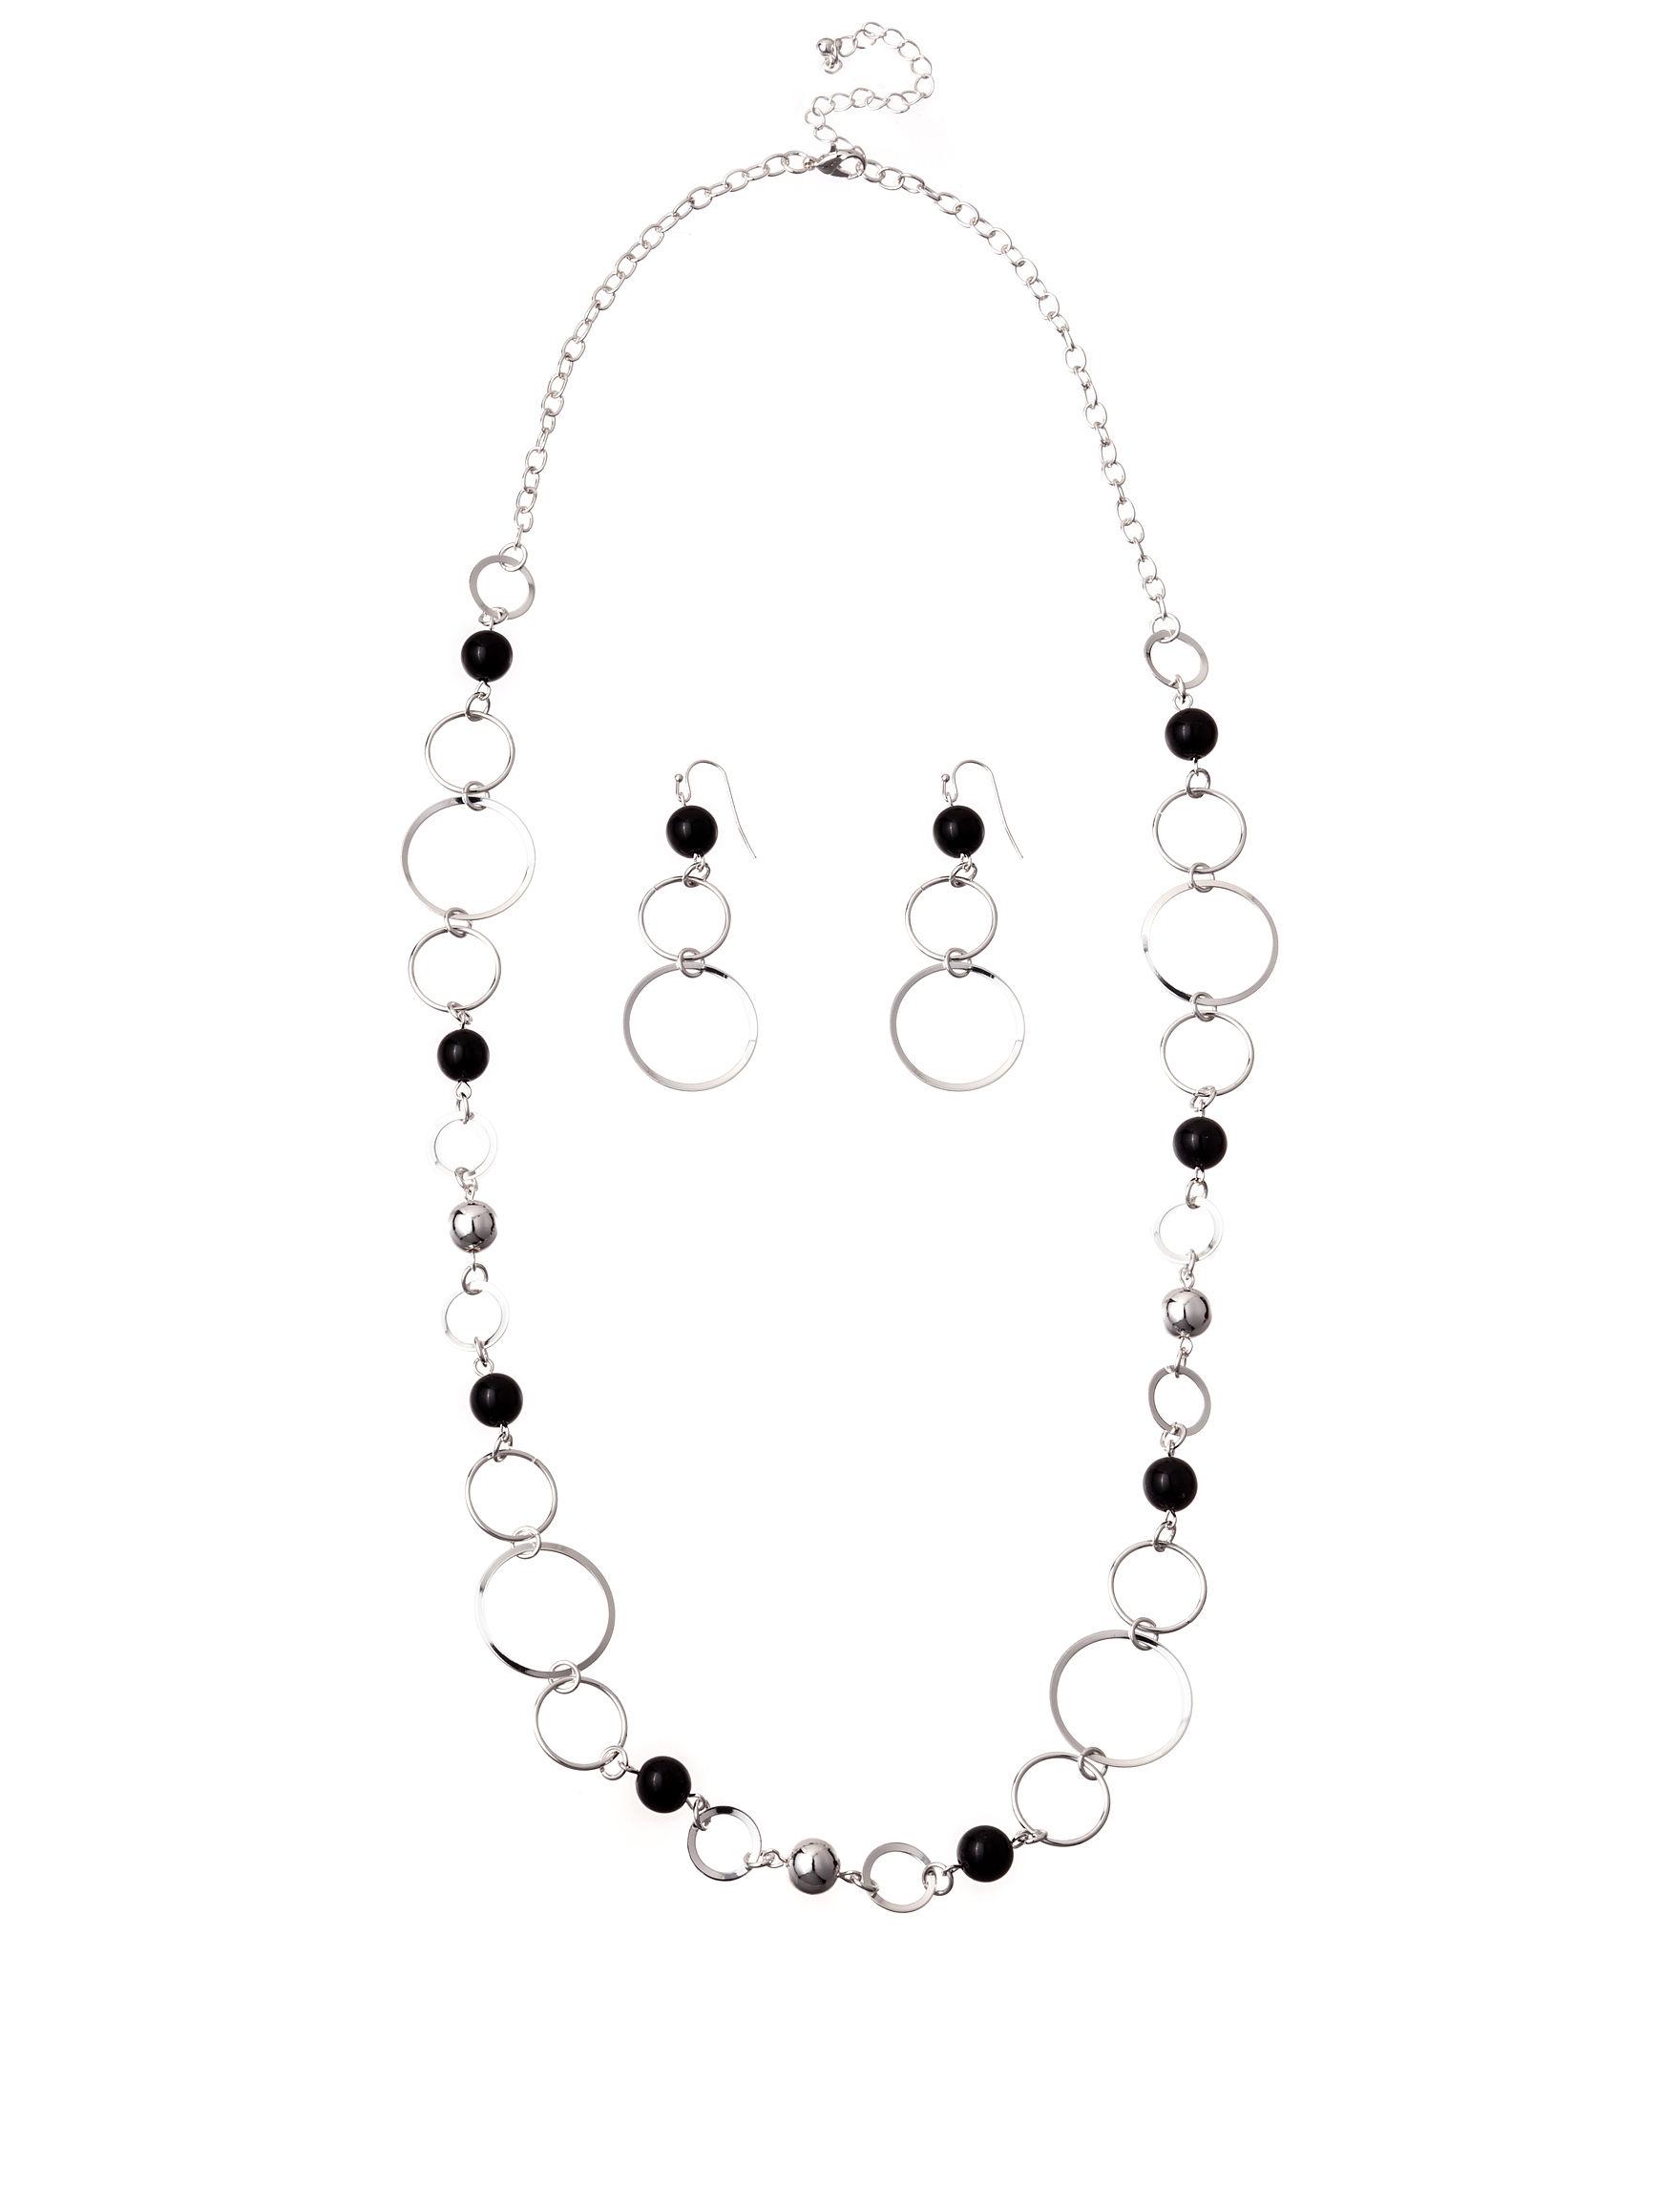 Hannah Black Drops Earrings Jewelry Sets Necklaces & Pendants Fashion Jewelry